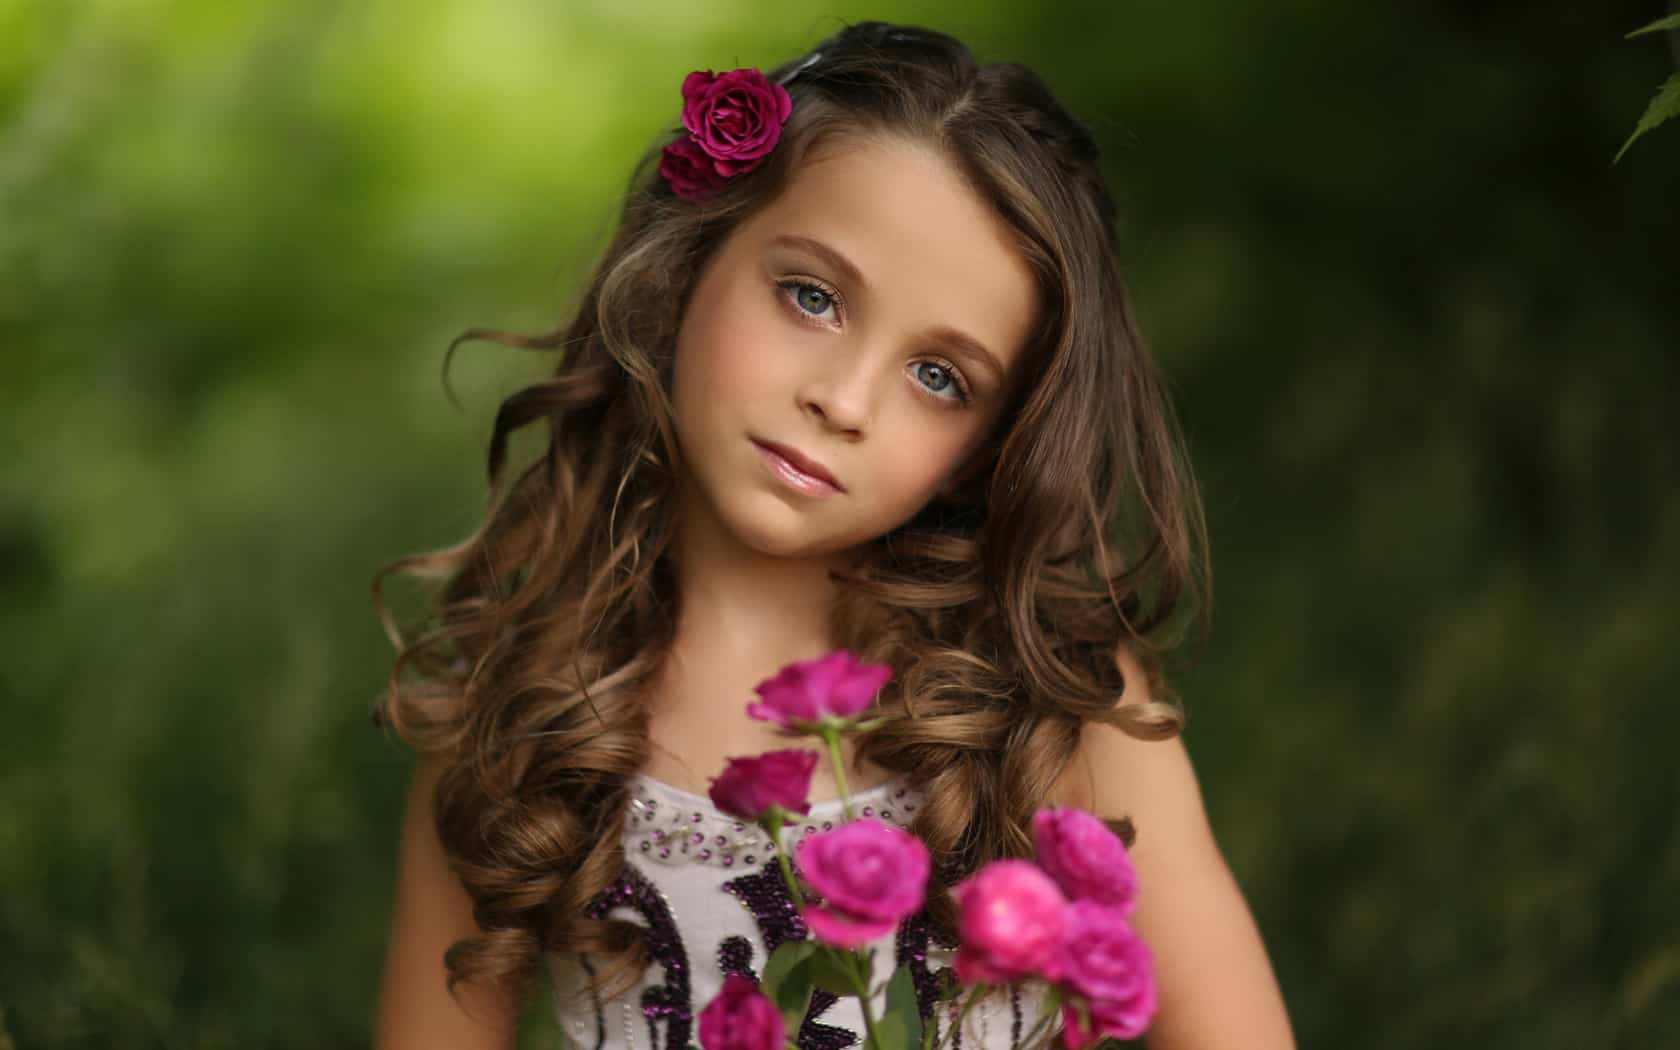 девочка с именем алсу